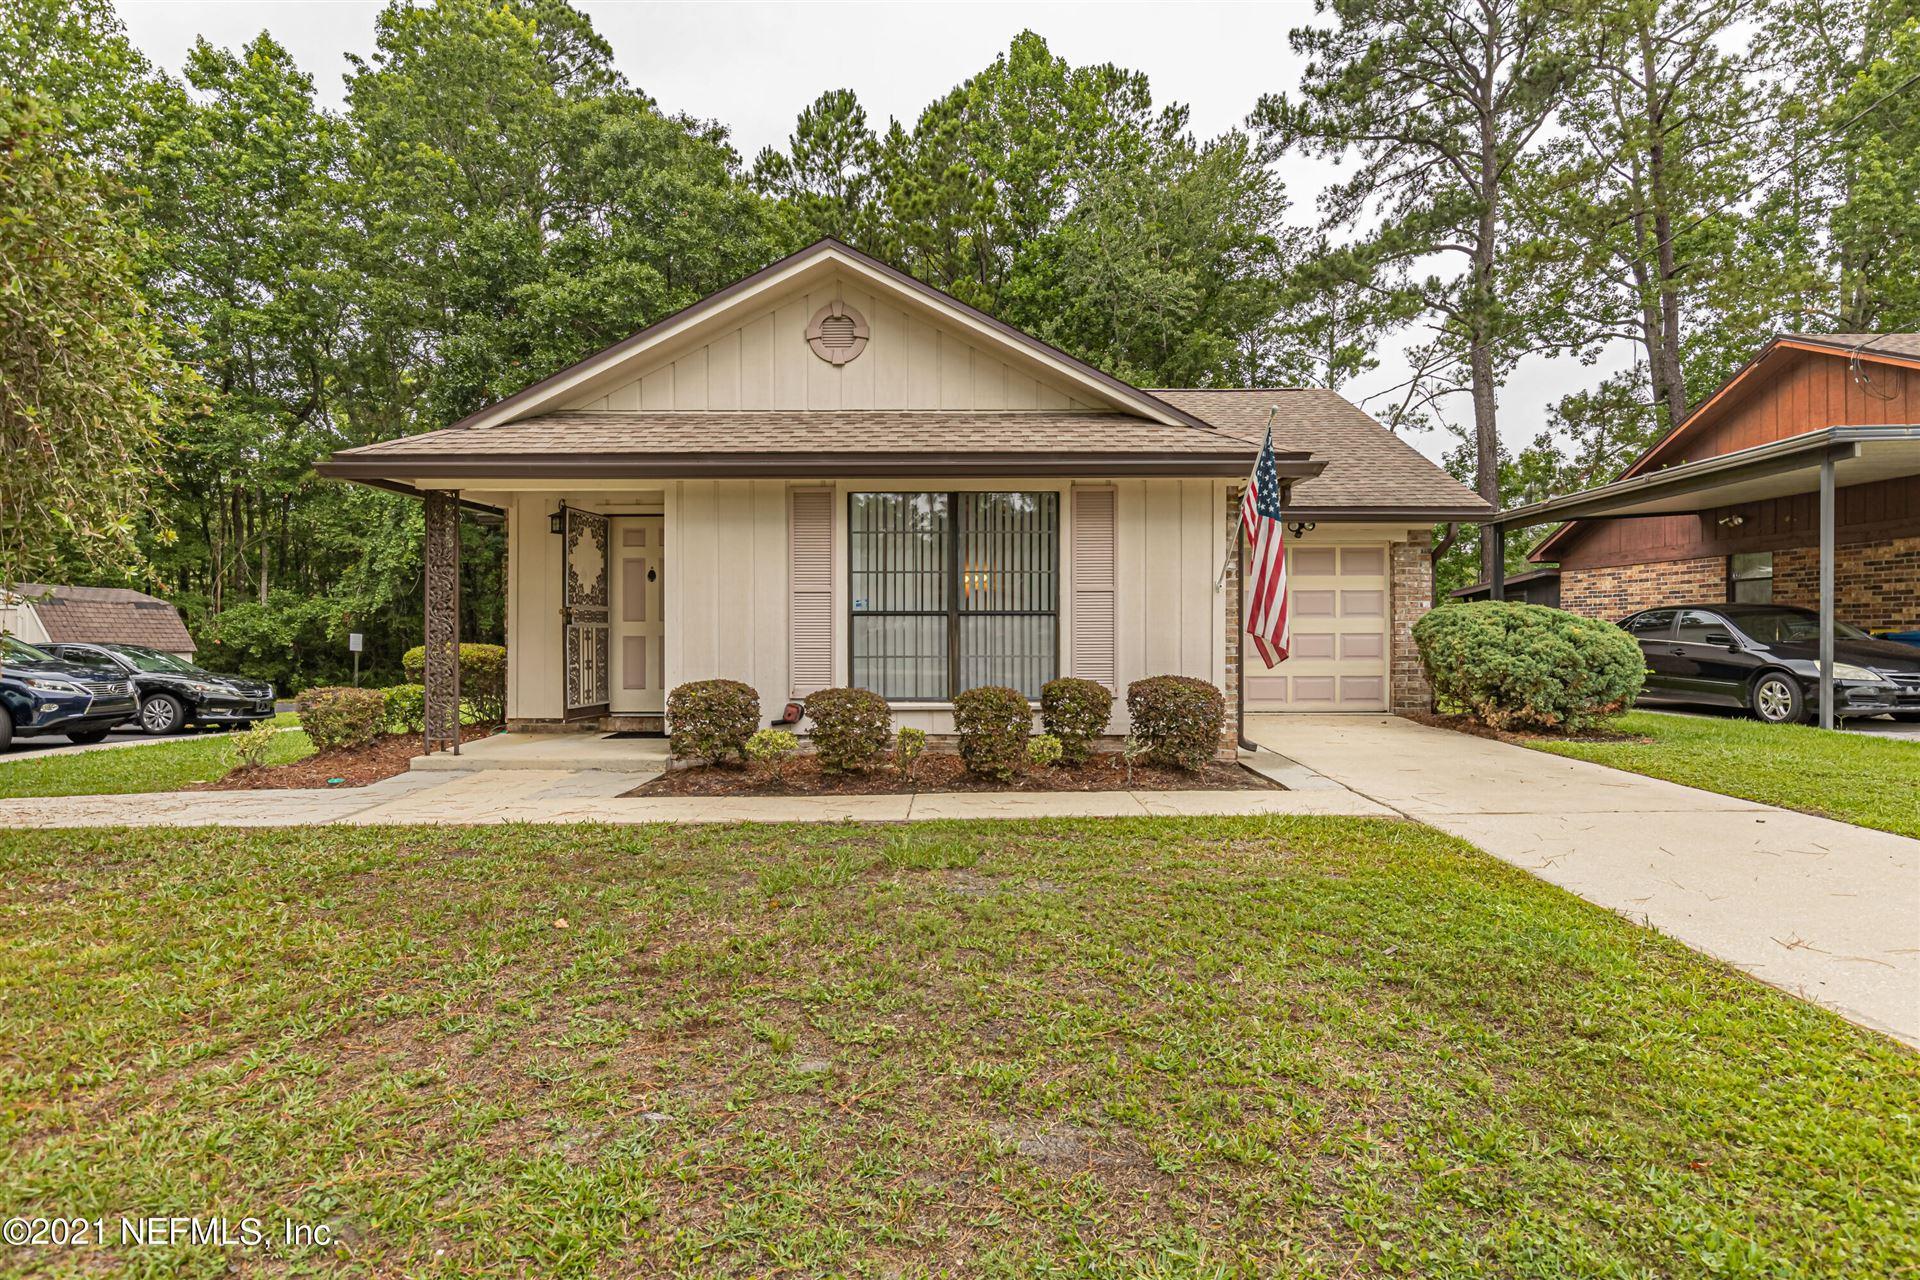 11654 BISCAYNE BLVD #Unit No: 2 Lot No: 1, Jacksonville, FL 32218 - MLS#: 1116345